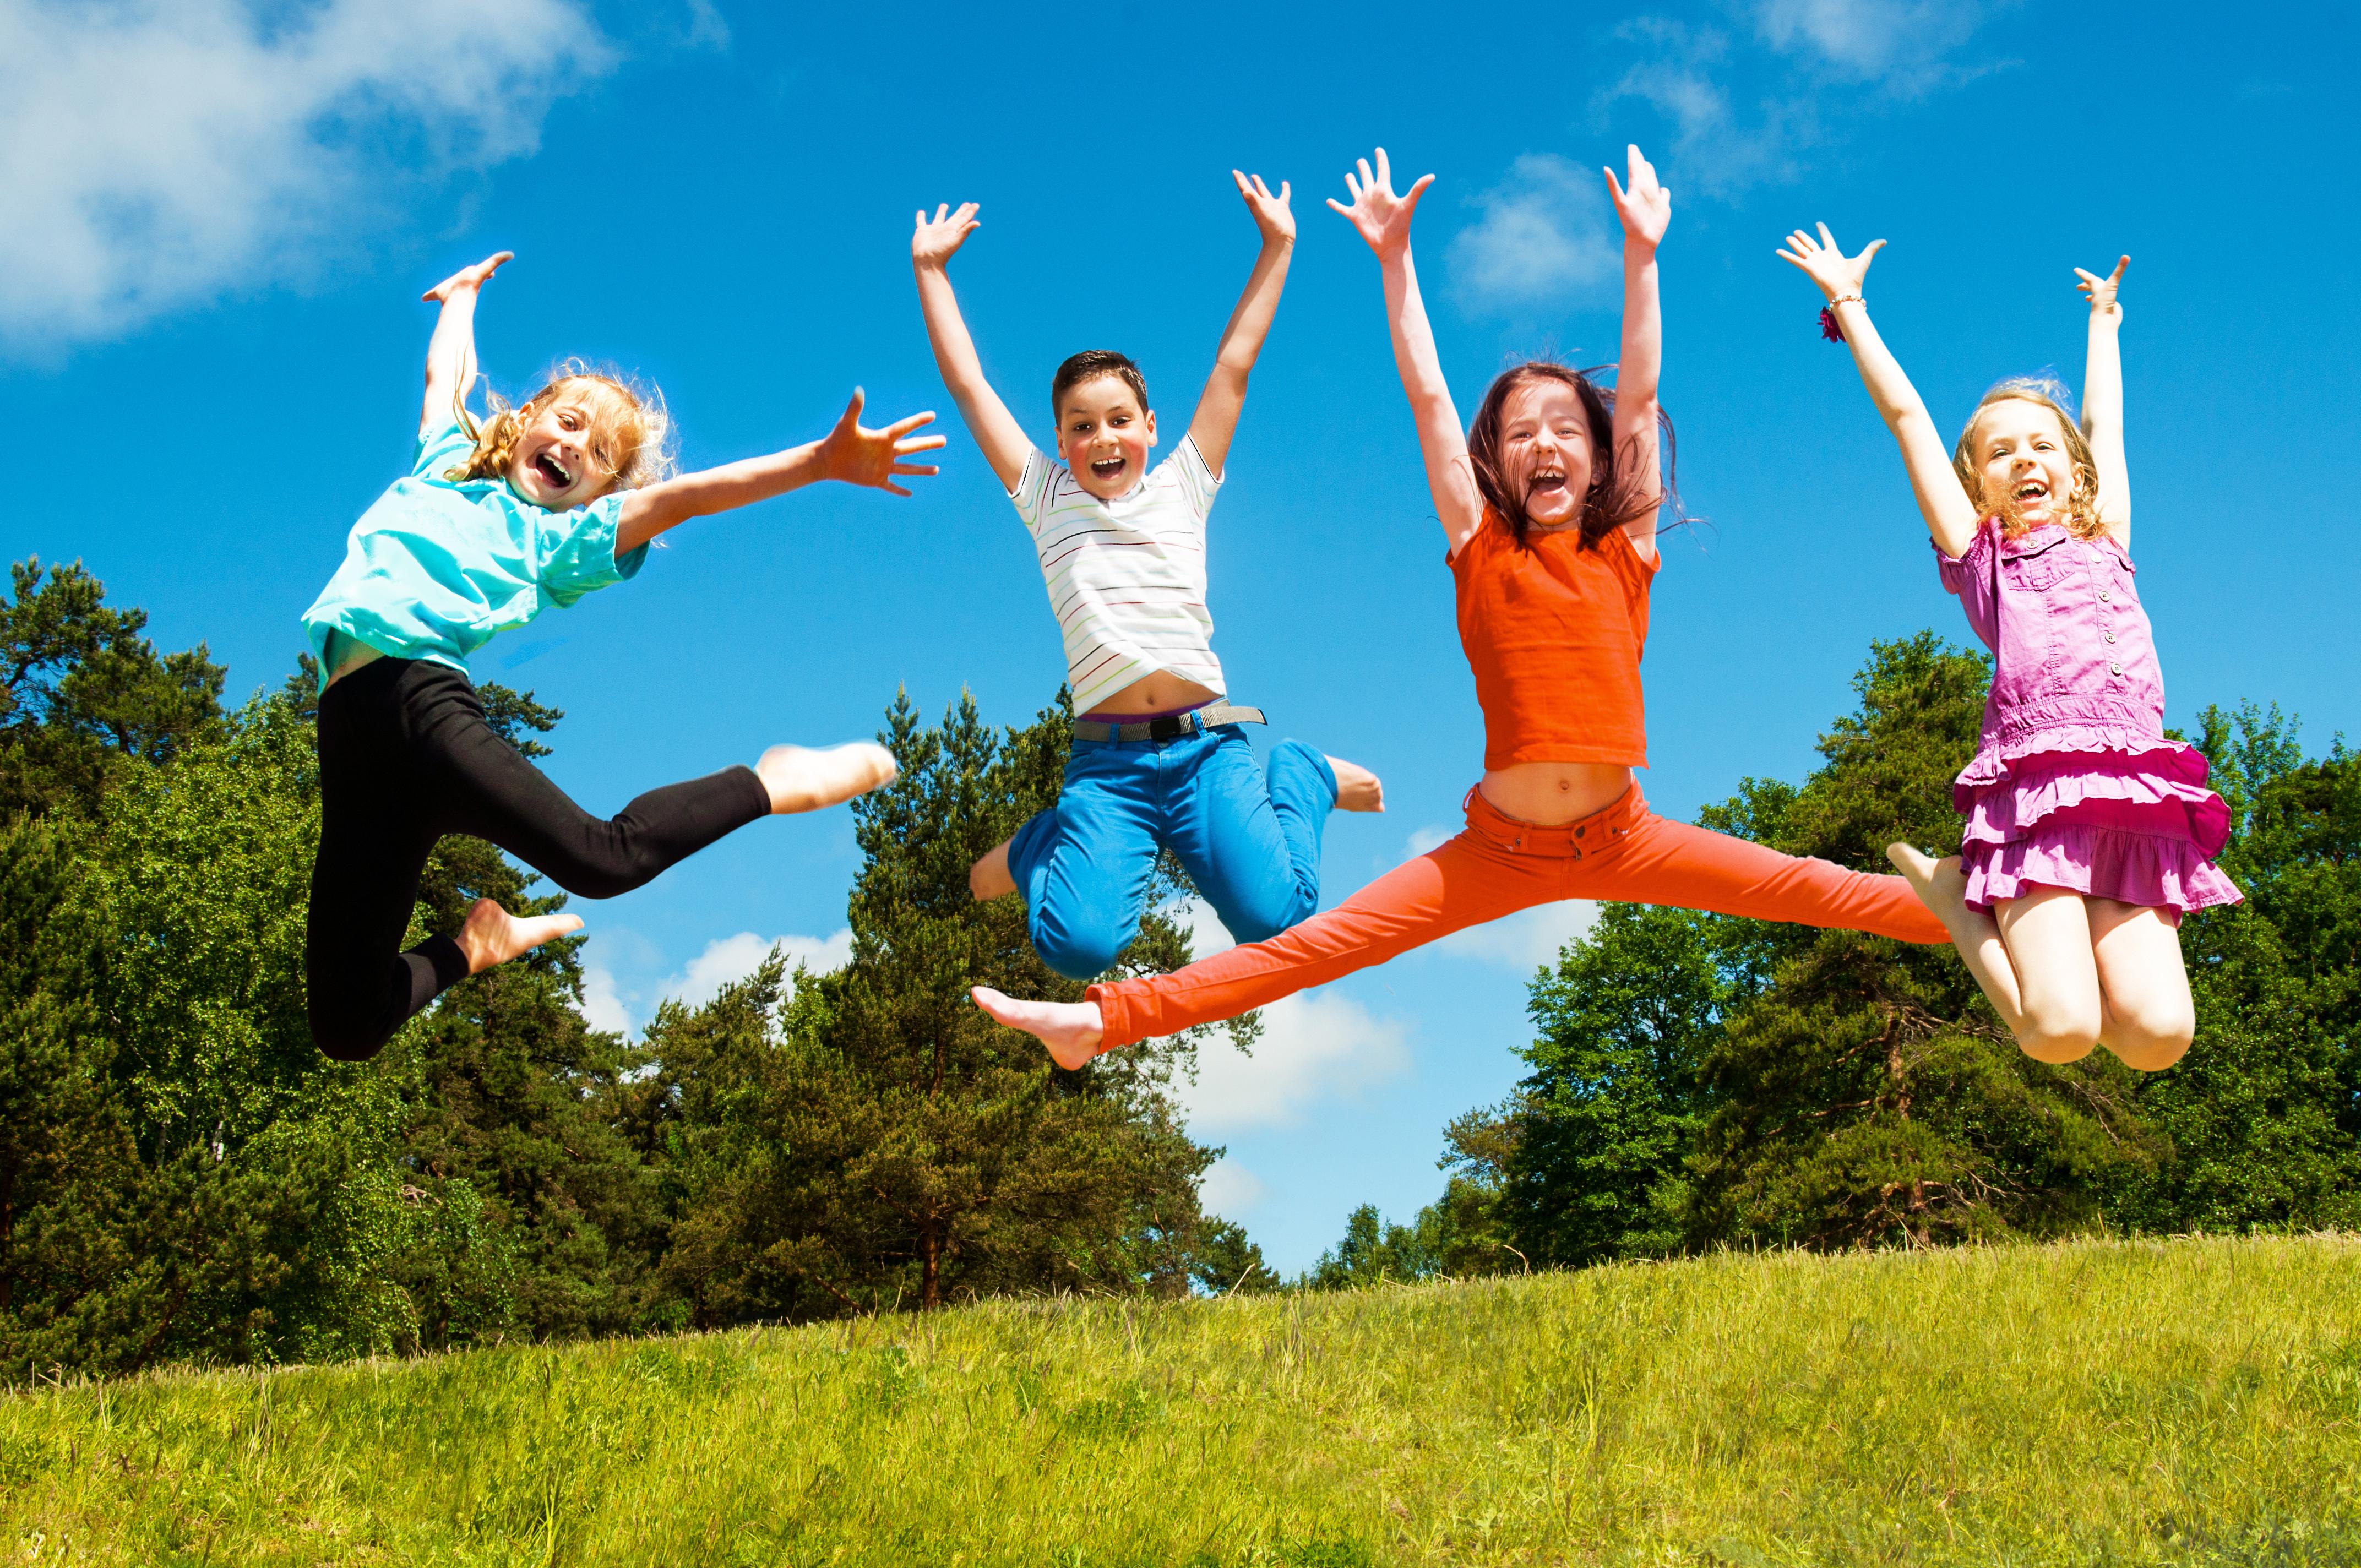 SUMMER KIDS ACTION TIME